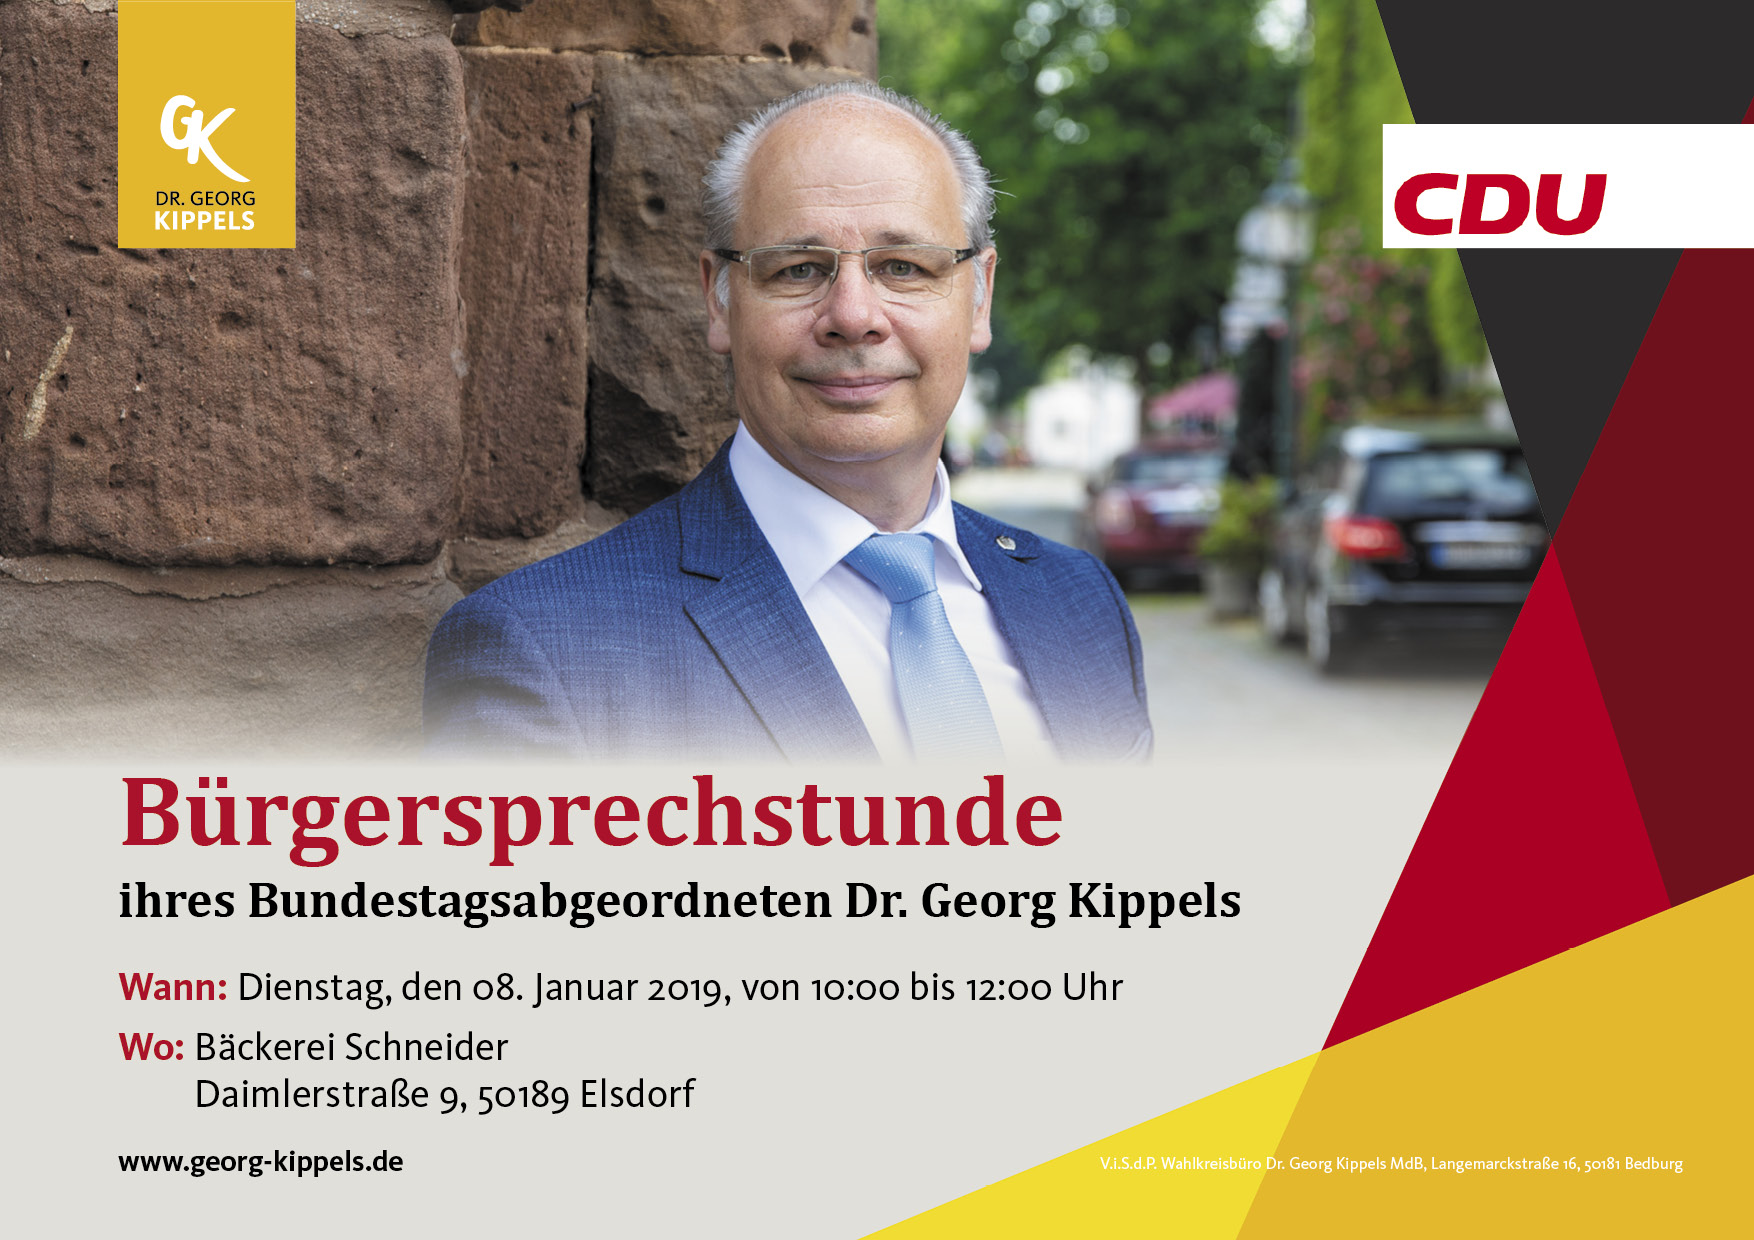 Bürgerspechstunde in Elsdorf